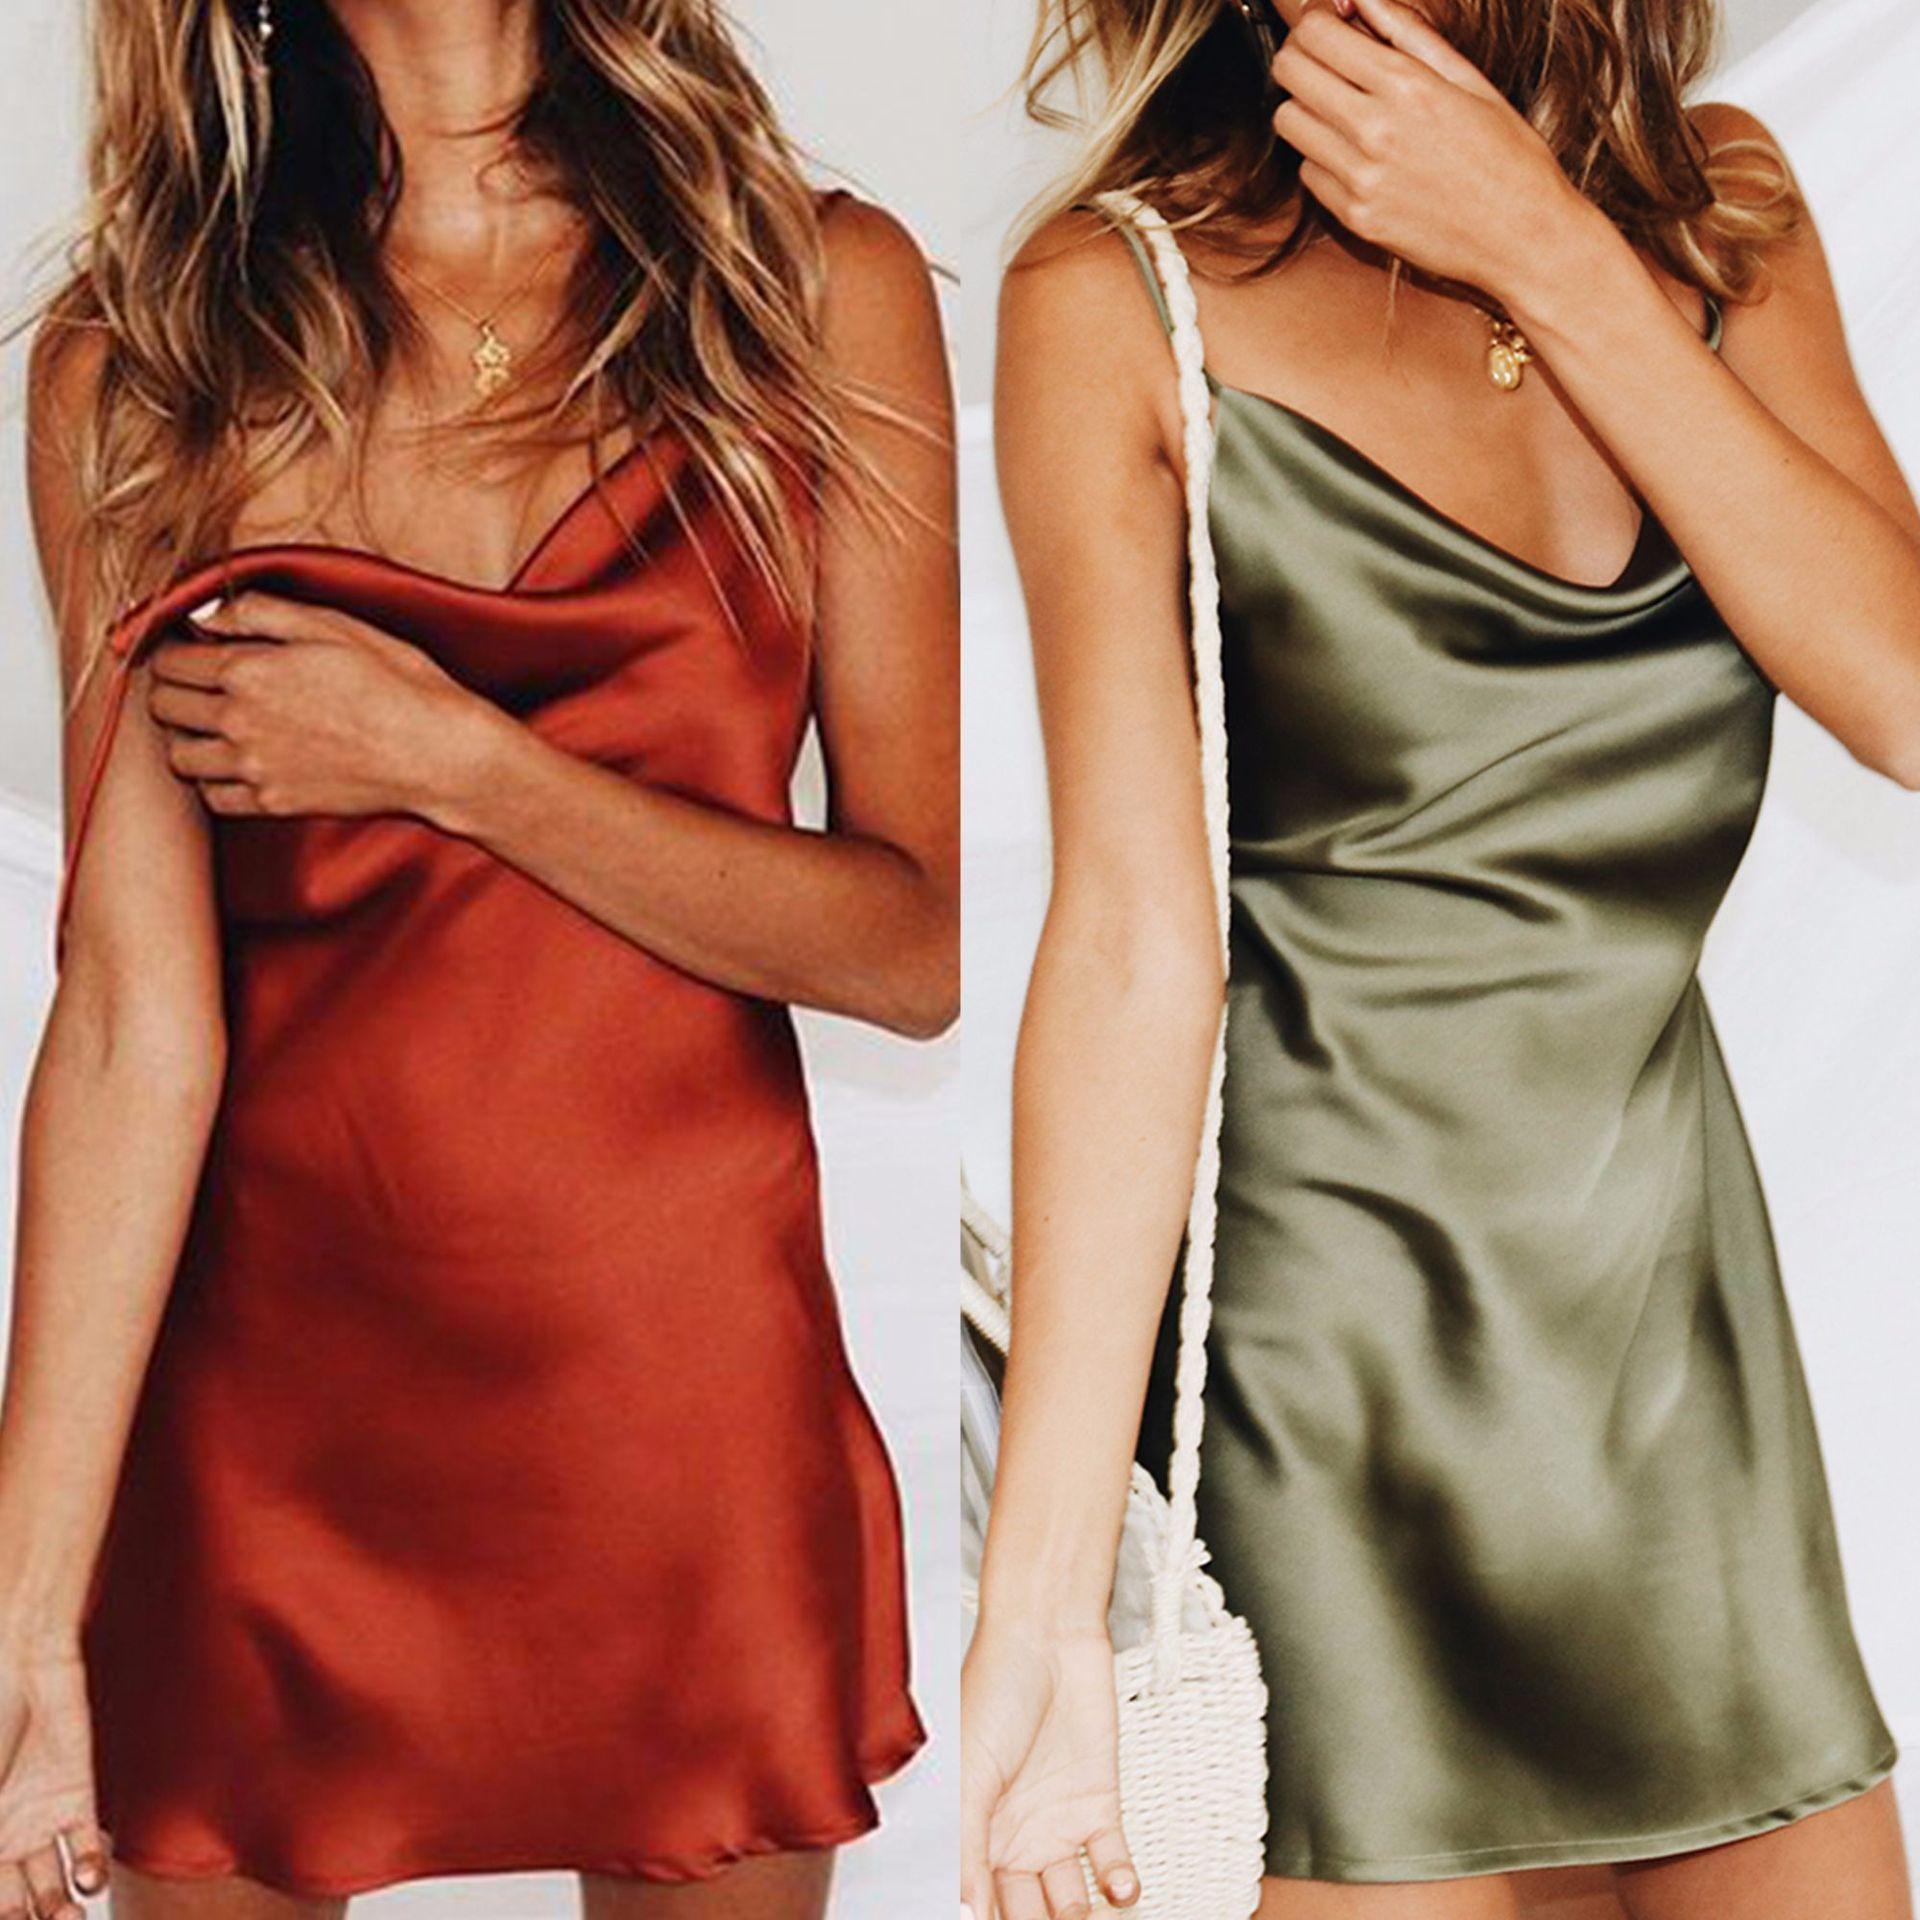 Summer Satin Dress Women Sexy Strap Green Backless Night Club Silk Slip Dress 2019